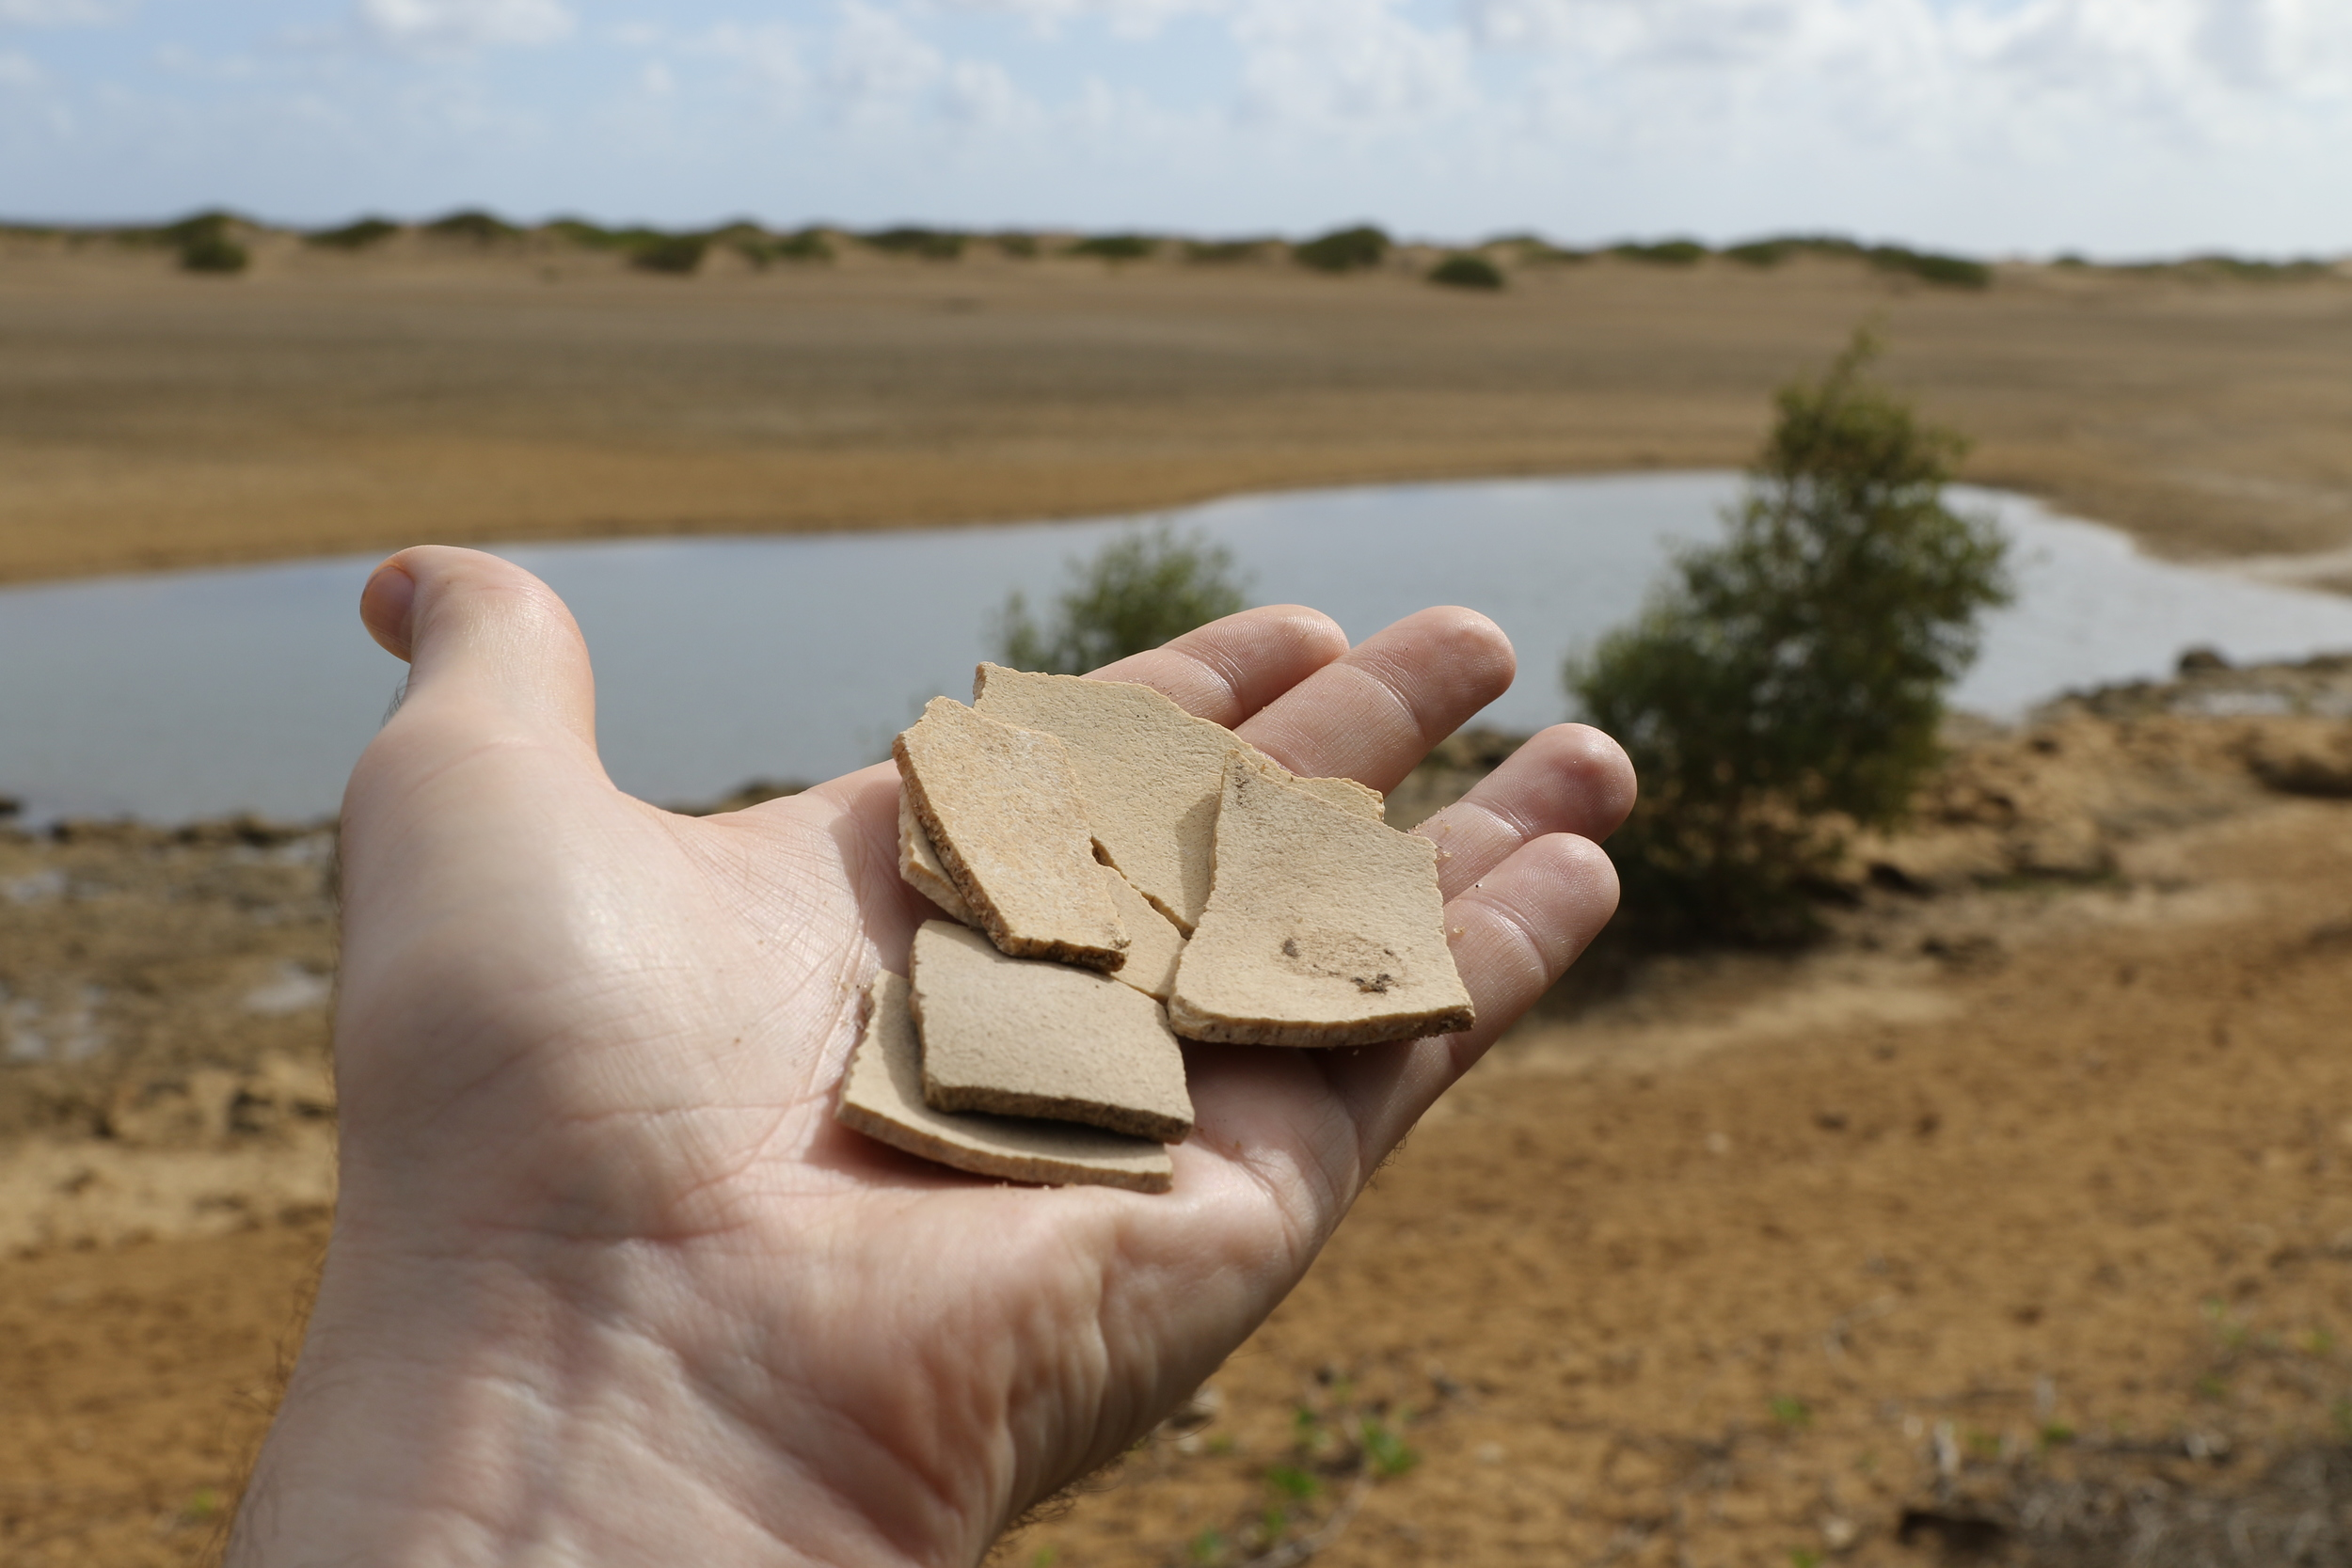 Extinct giant elephant bird ( Aepyornis  spp.) eggshell fragments from near Manombo, north of Toliara, Madagascar.